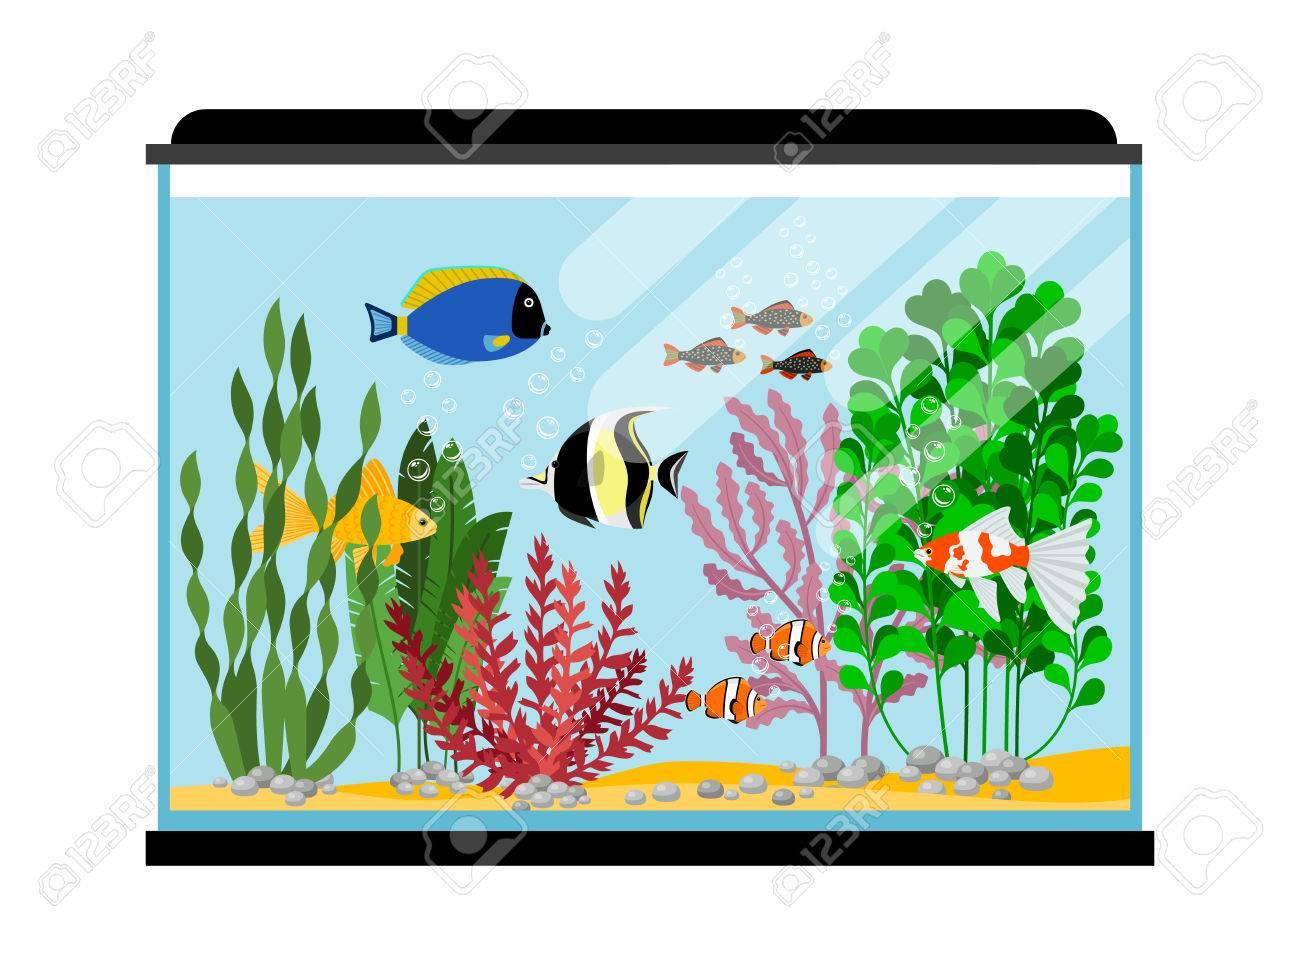 Cartoon Fishes In Aquarium Saltwater Or Freshwater Fish Tank